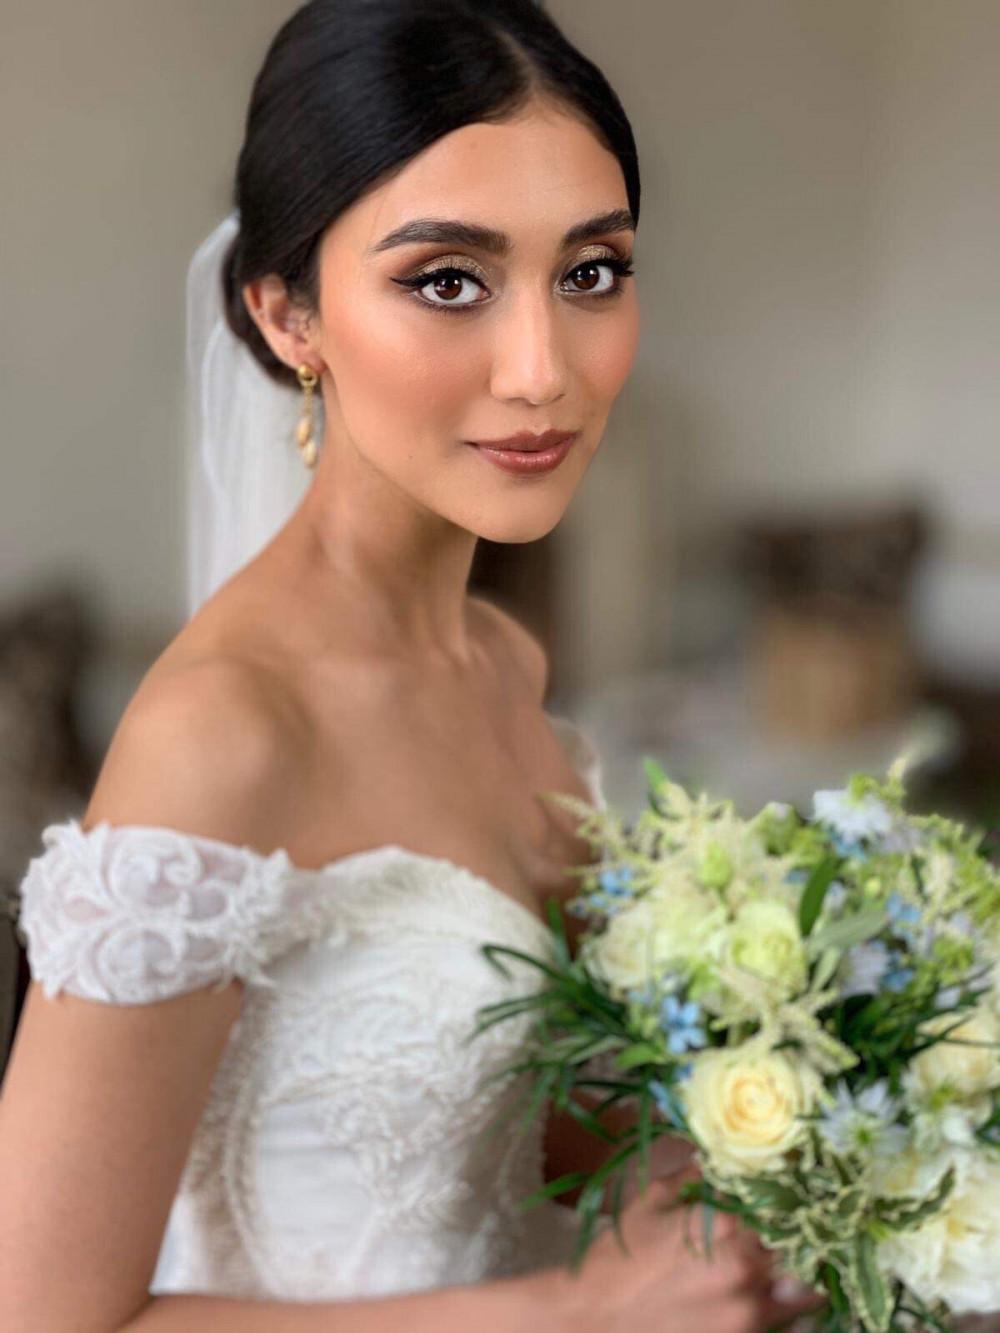 - Make Me Bridal Artist: Amy Goode Make-up Artist. Photography by: Amy Goode (me). #glamorous #naturalmakeup #bridalmakeup #smokeyeyes #motherofthebridal #eyeliner #dewyskin #londonwedding #flickliner